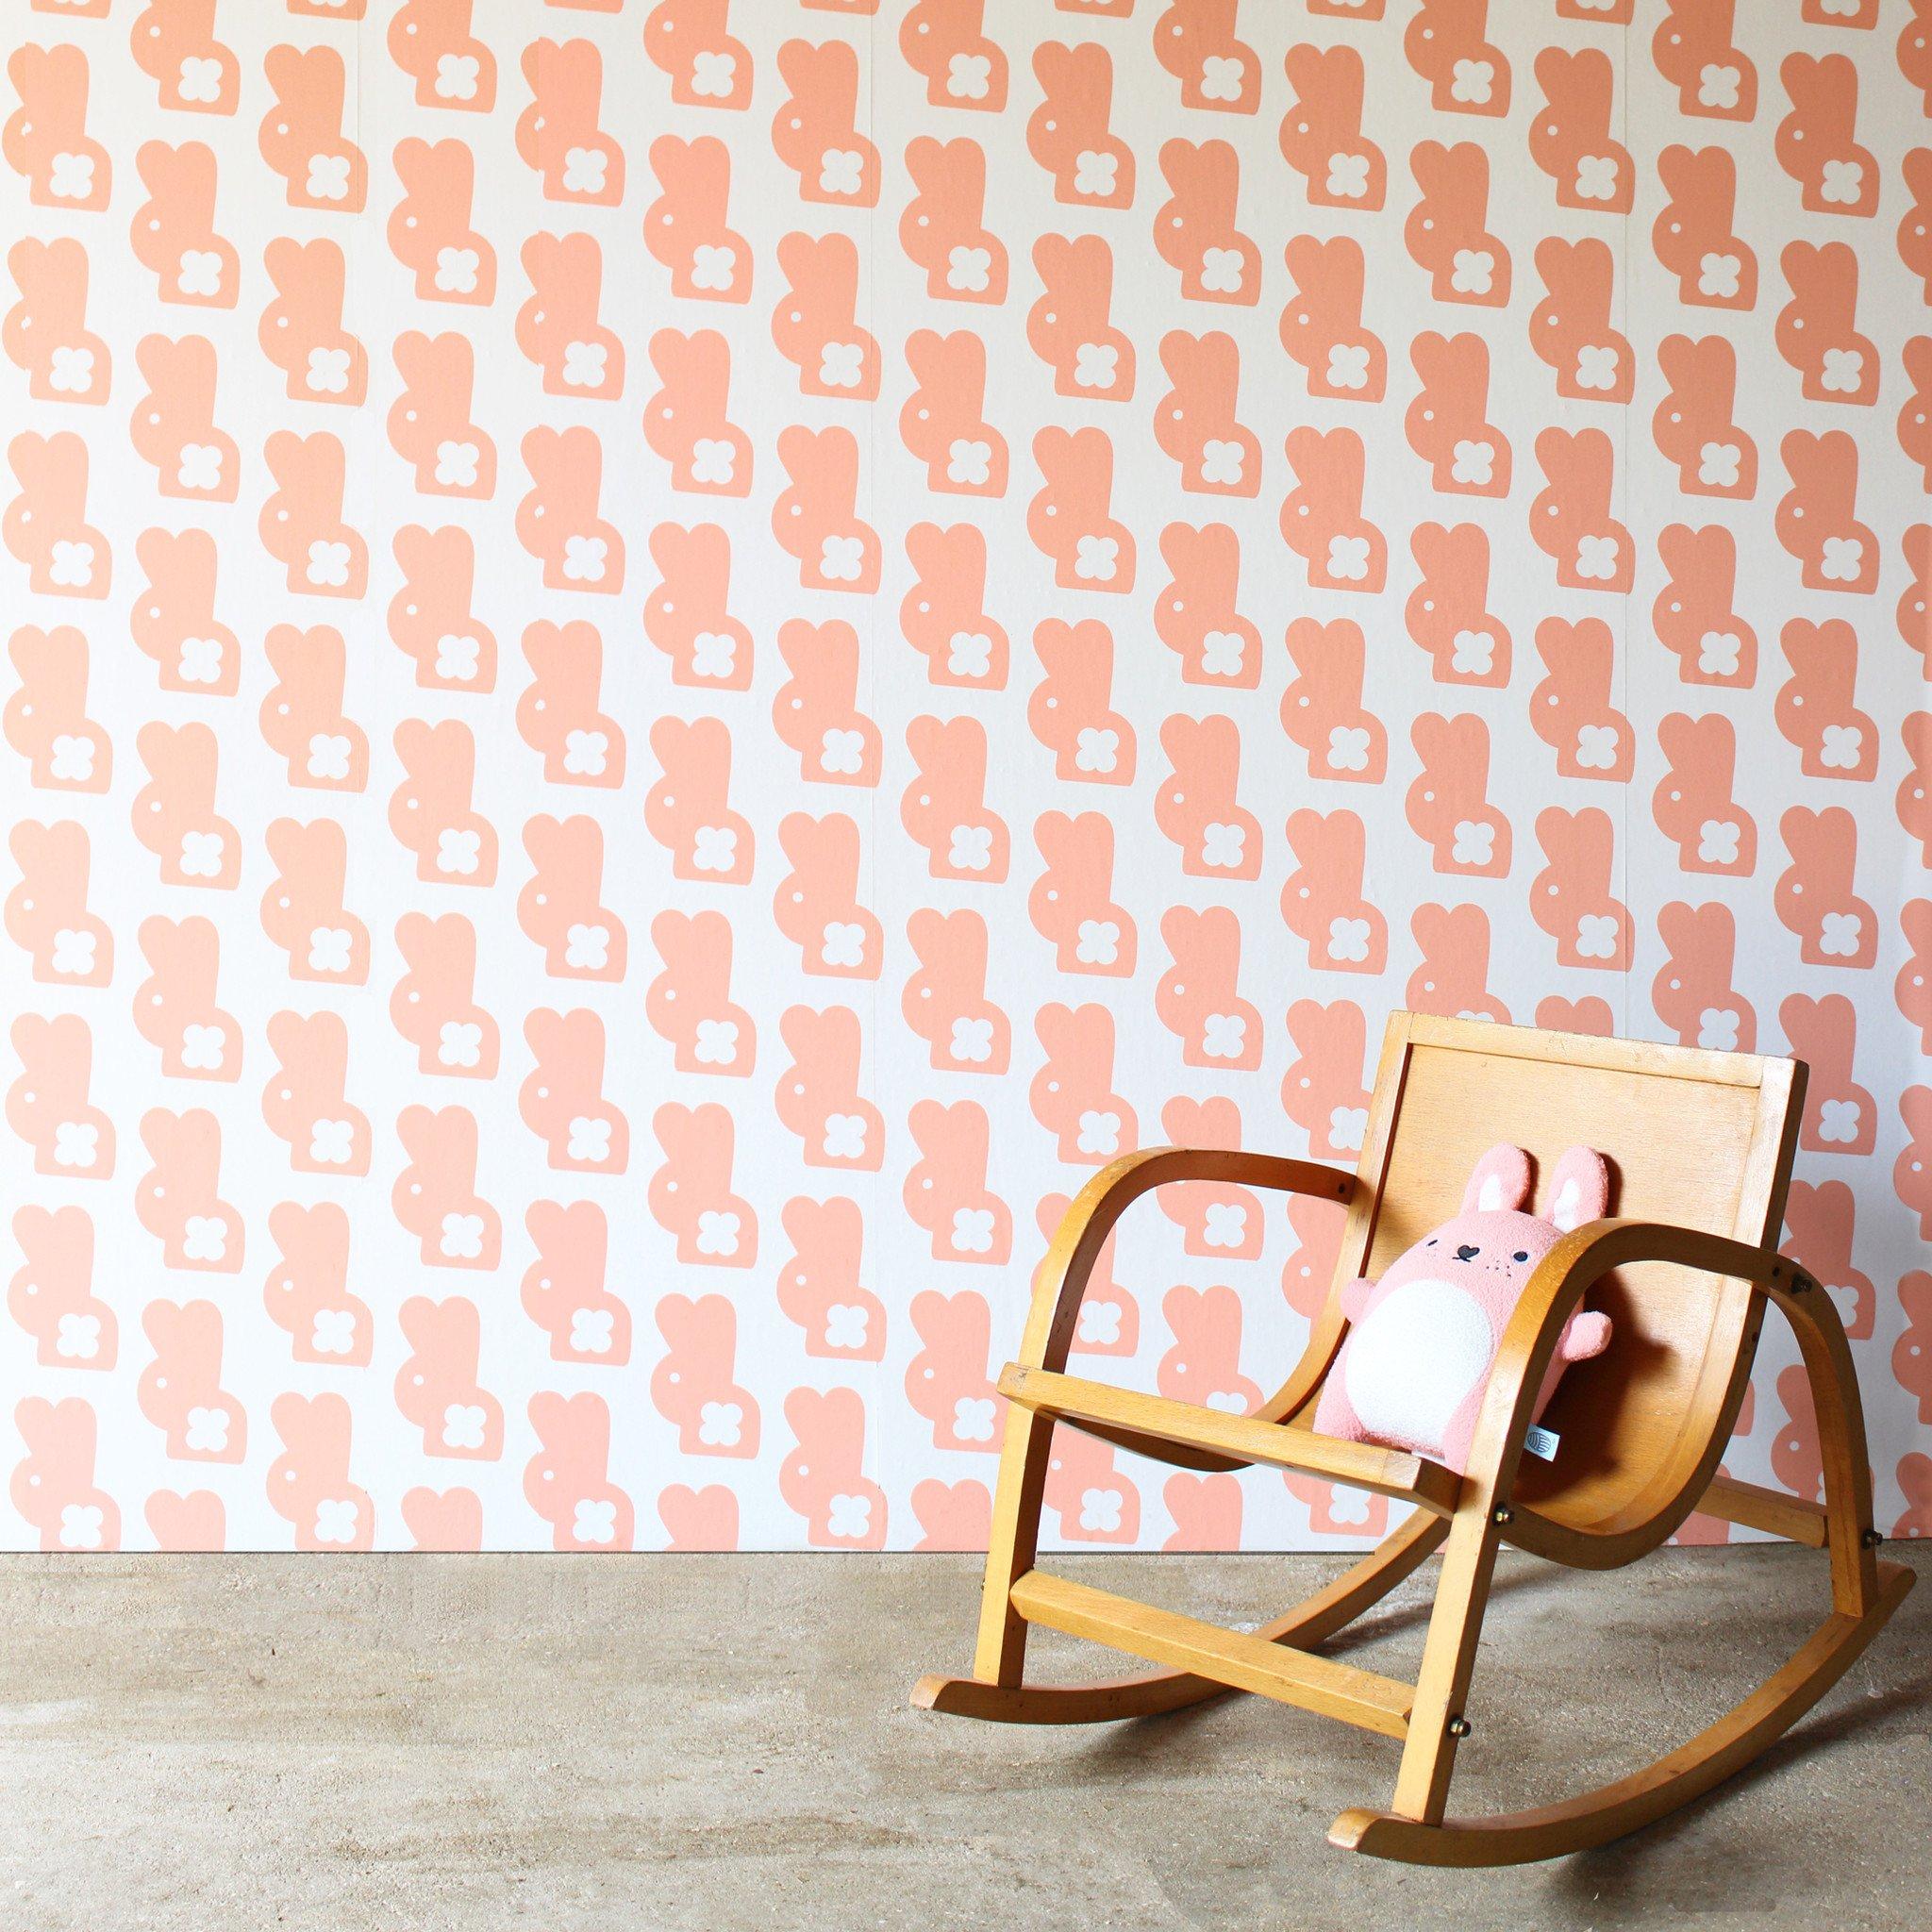 Bunny Wallpaper   Pink Shake   racheljpowell 2048x2048